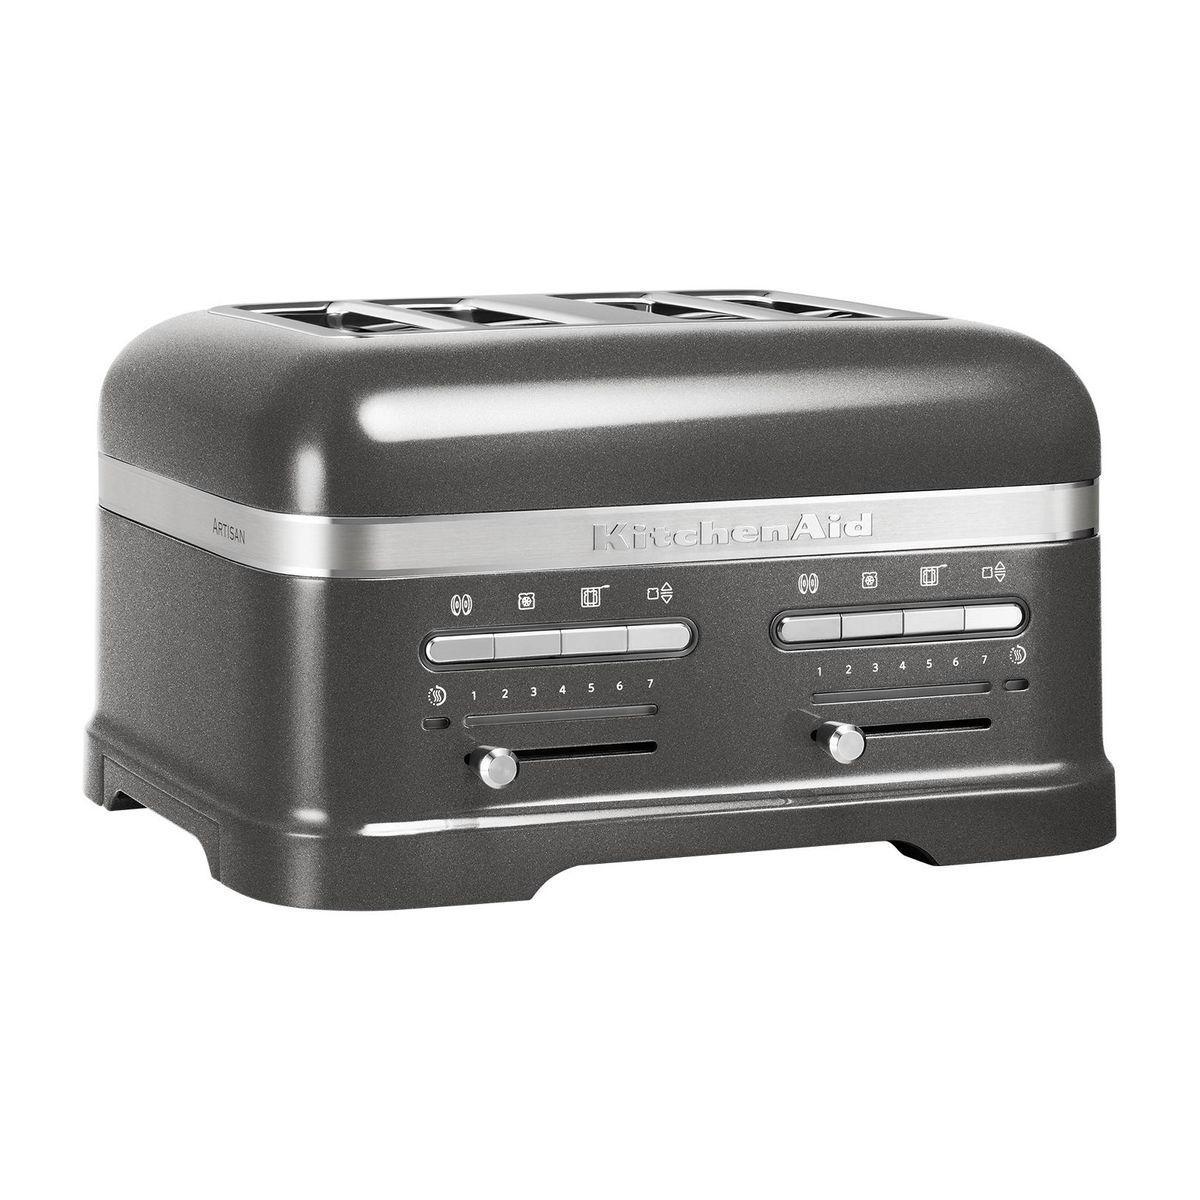 kitchenaid artisan 5kmt4205e toaster 4 slices kitchenaid. Black Bedroom Furniture Sets. Home Design Ideas